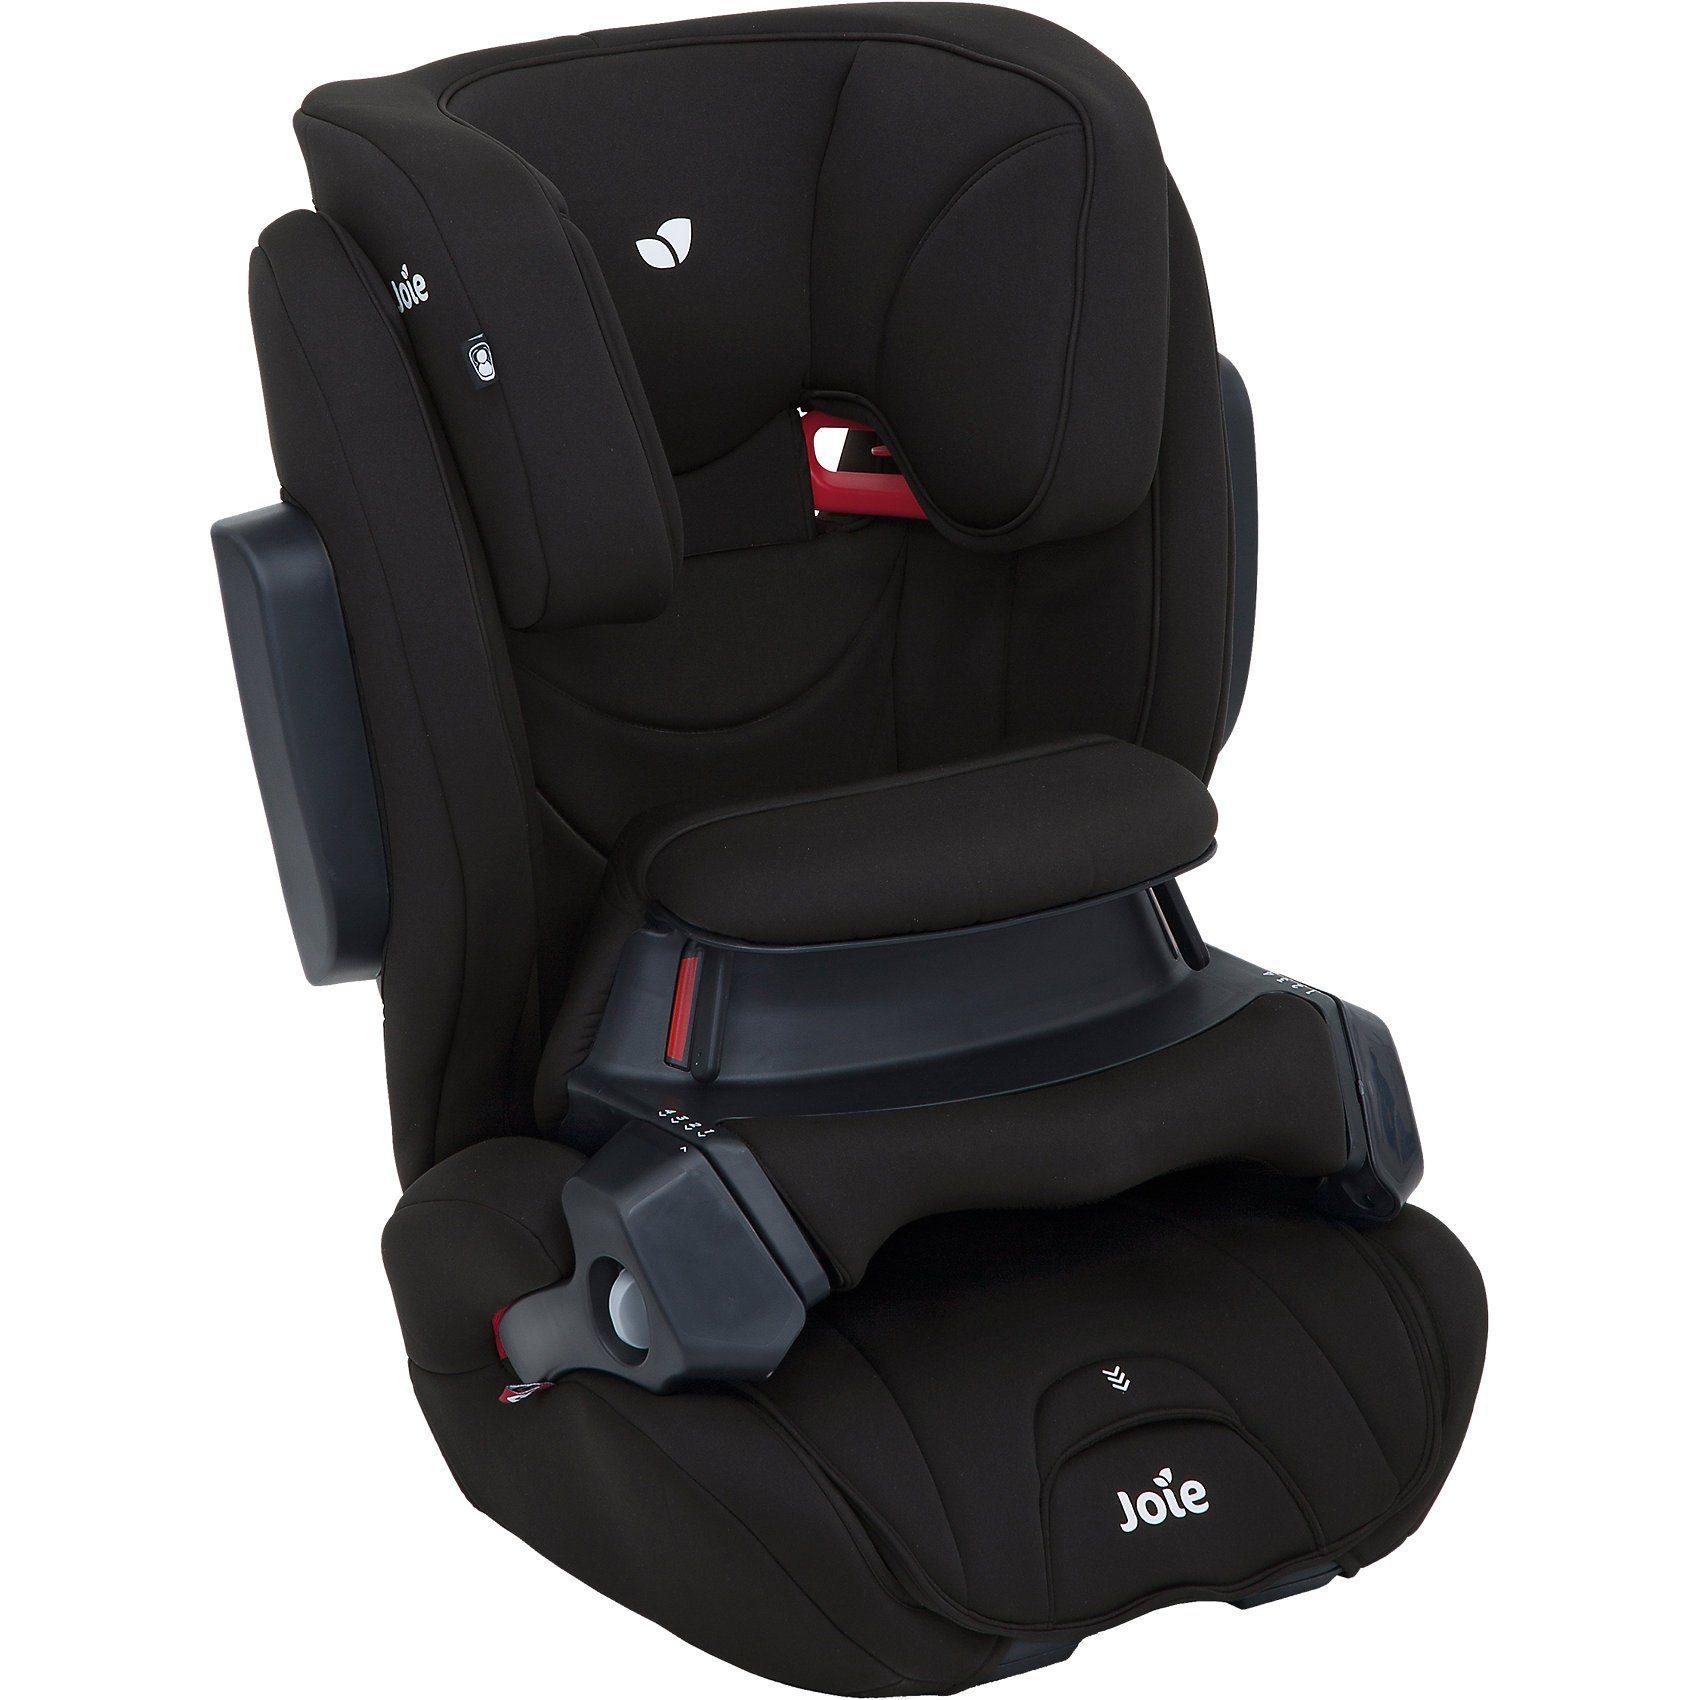 Joie Auto-Kindersitz Traver Shield, Coal